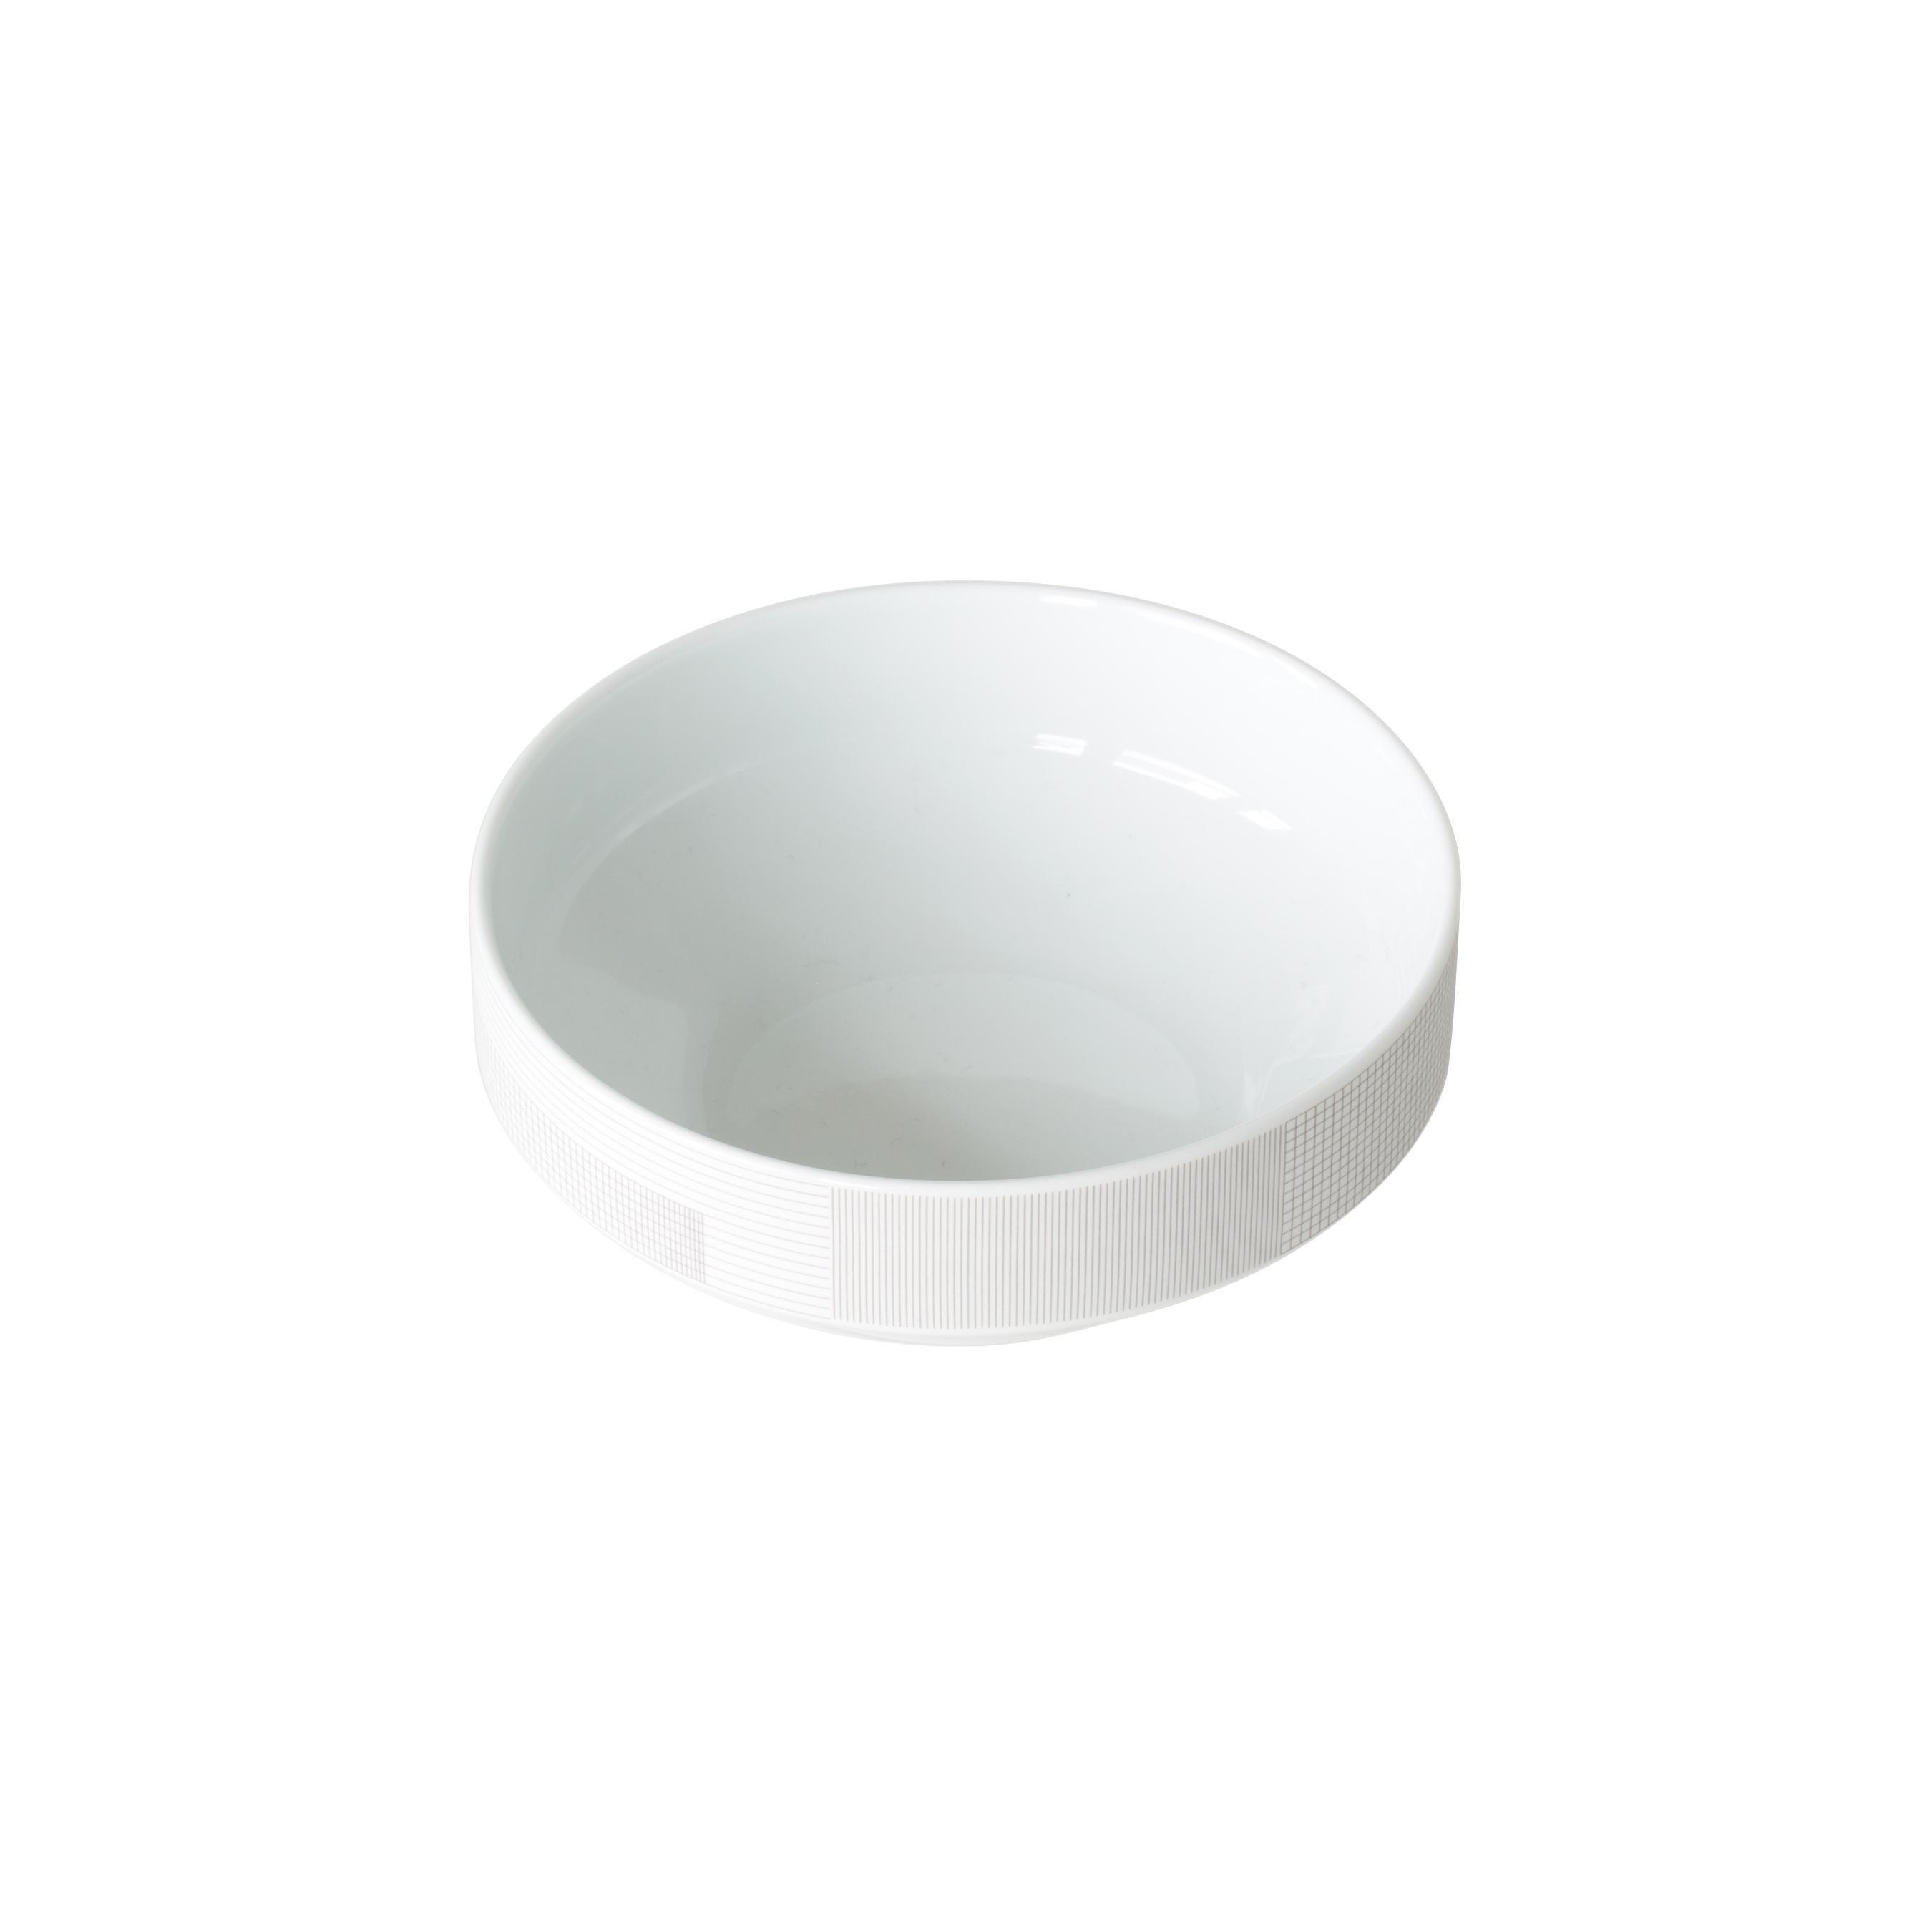 Maharam Pattern Porcelain Bowl by Scholten & Baijings